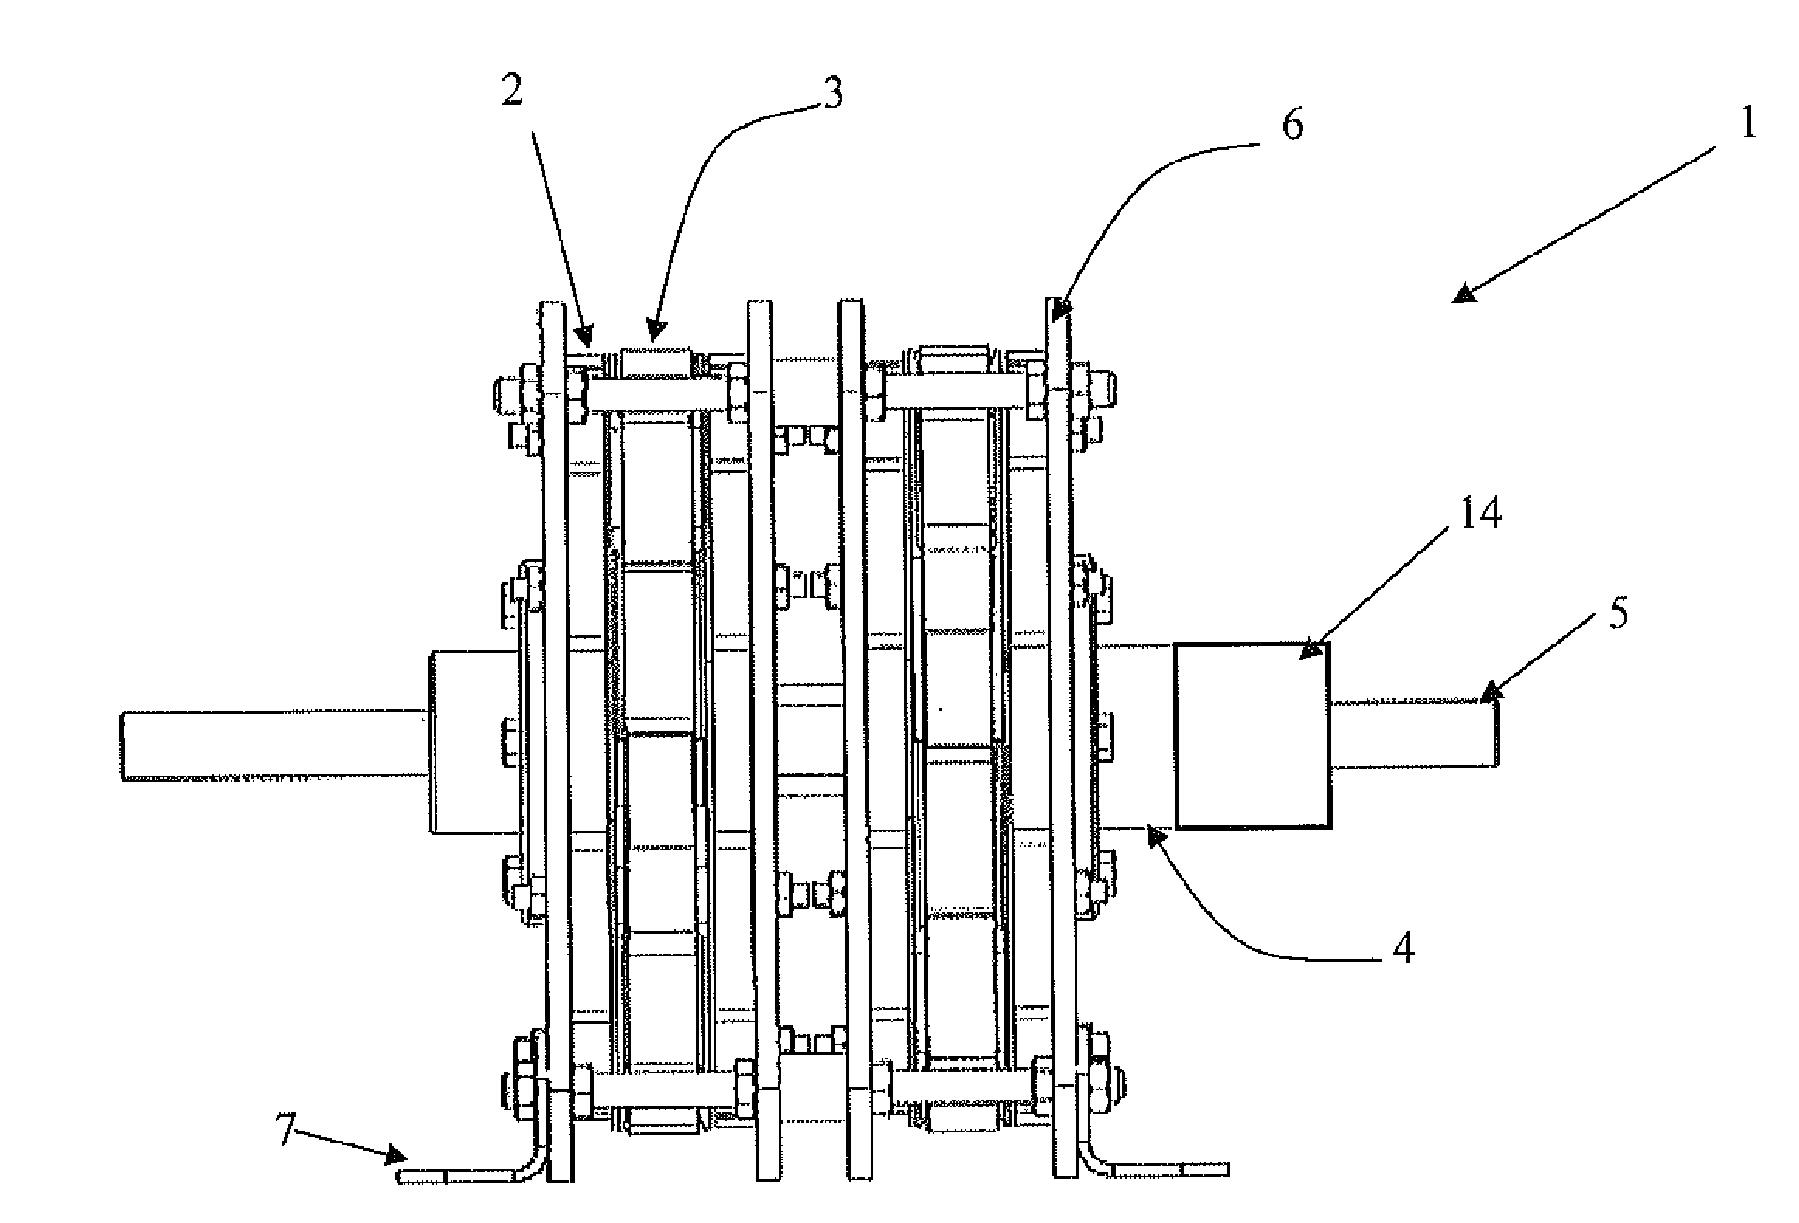 Jayco Fuse Box - Wiring Diagrams List on